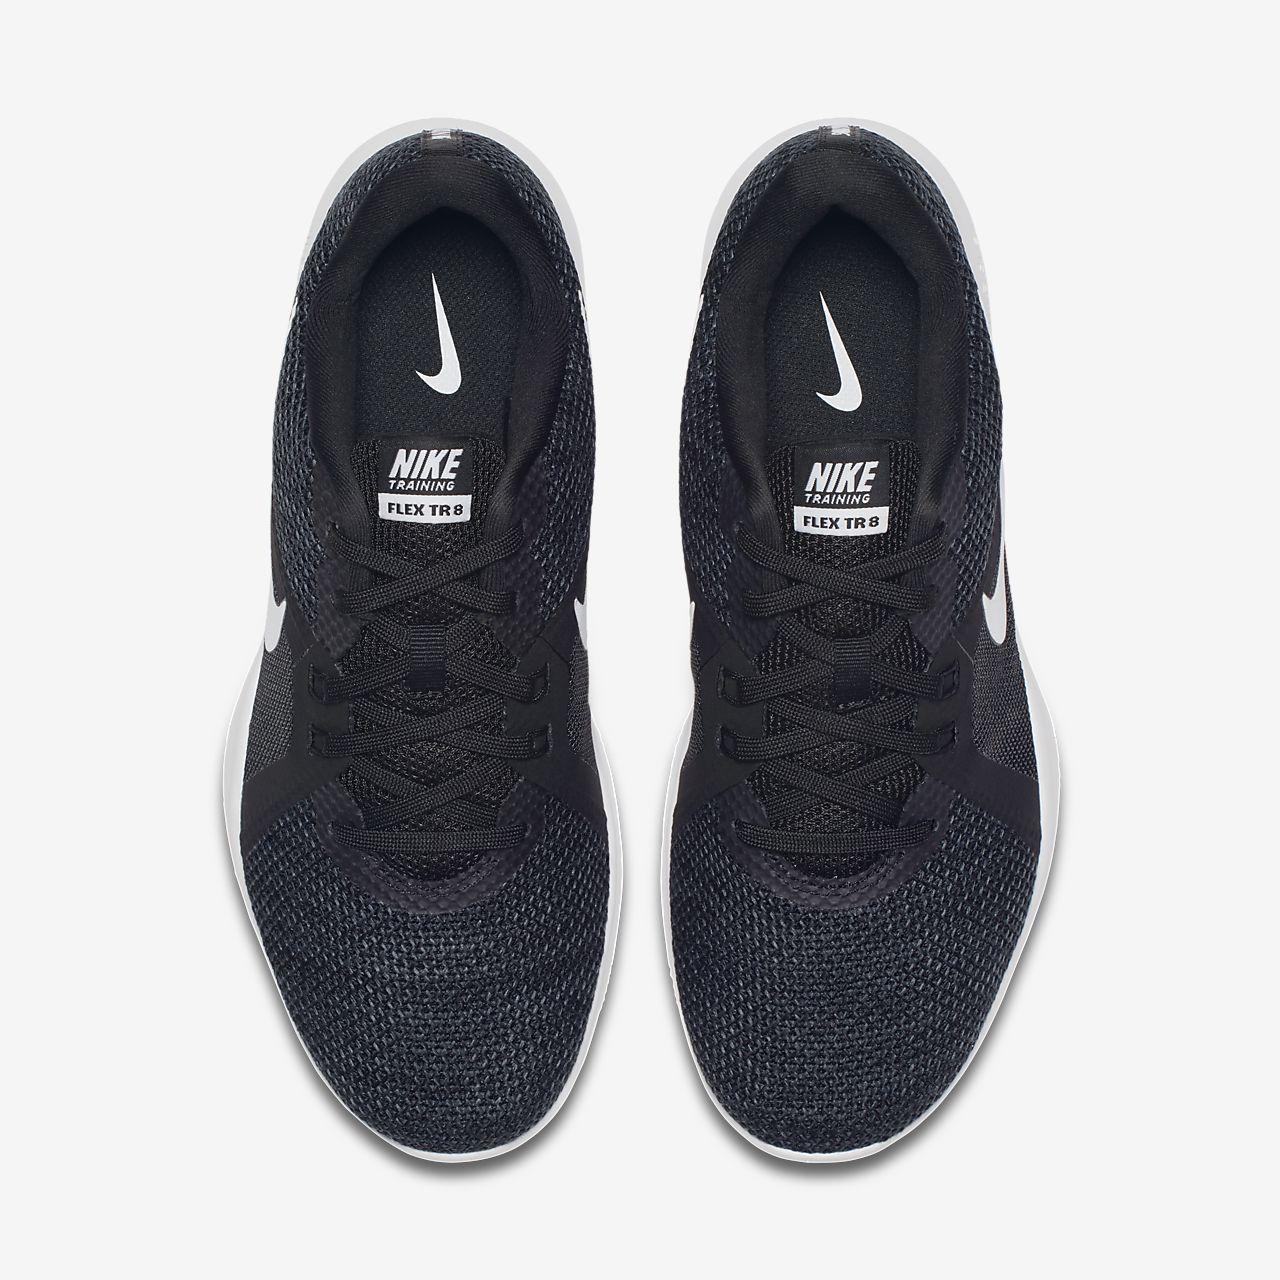 48f402128b0fc Nike Flex Trainer 8 (Wide) Women s Training Shoe. Nike.com